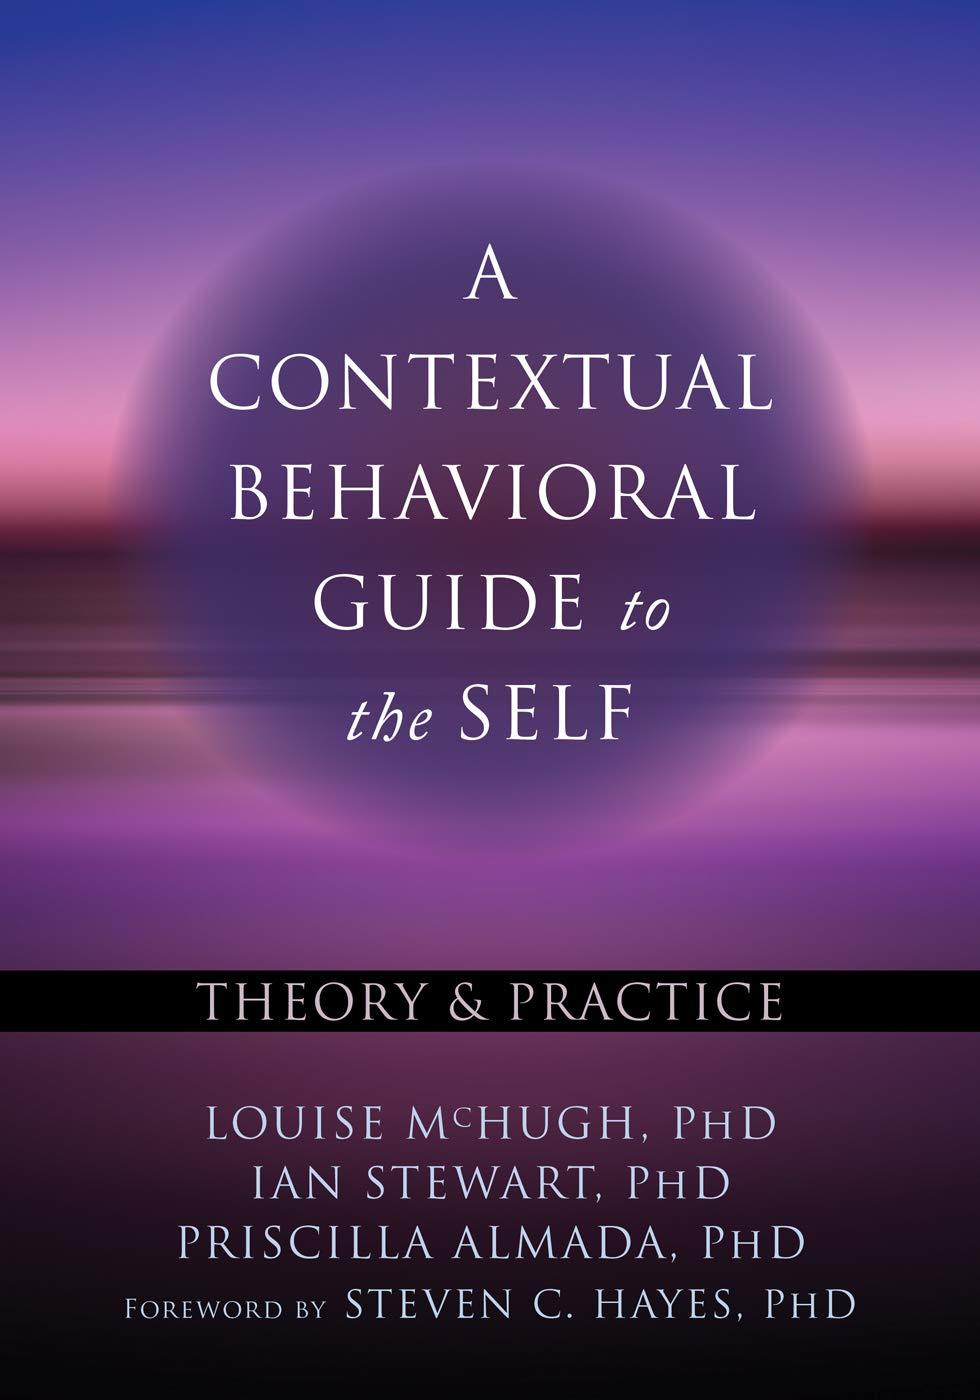 A Contextual Behavioral Guide to the Self (The Context Press Mastering Act)